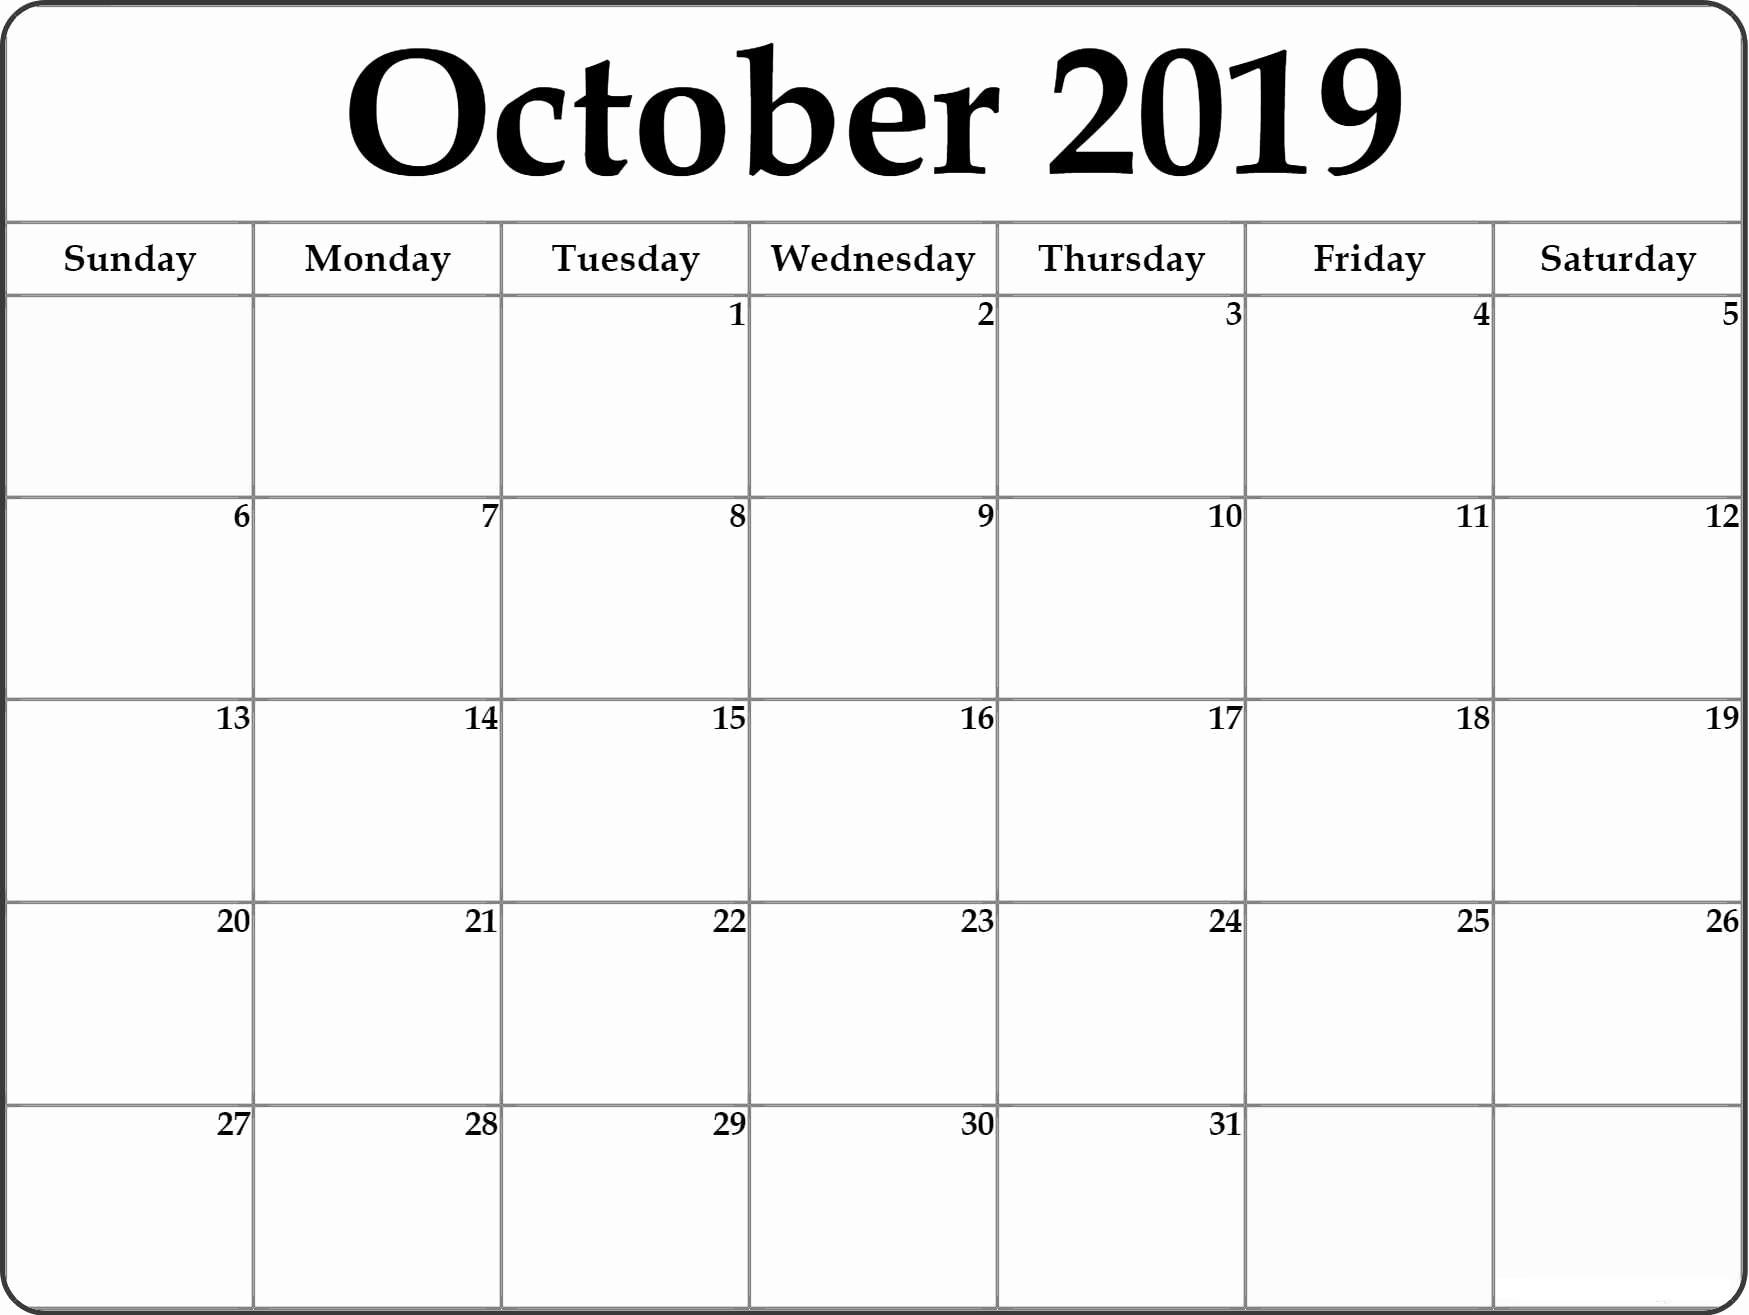 October 2019 Calendar With Holidays Planner - Print Calendar inside Editable October 2019 Calendar With Religious Holidays